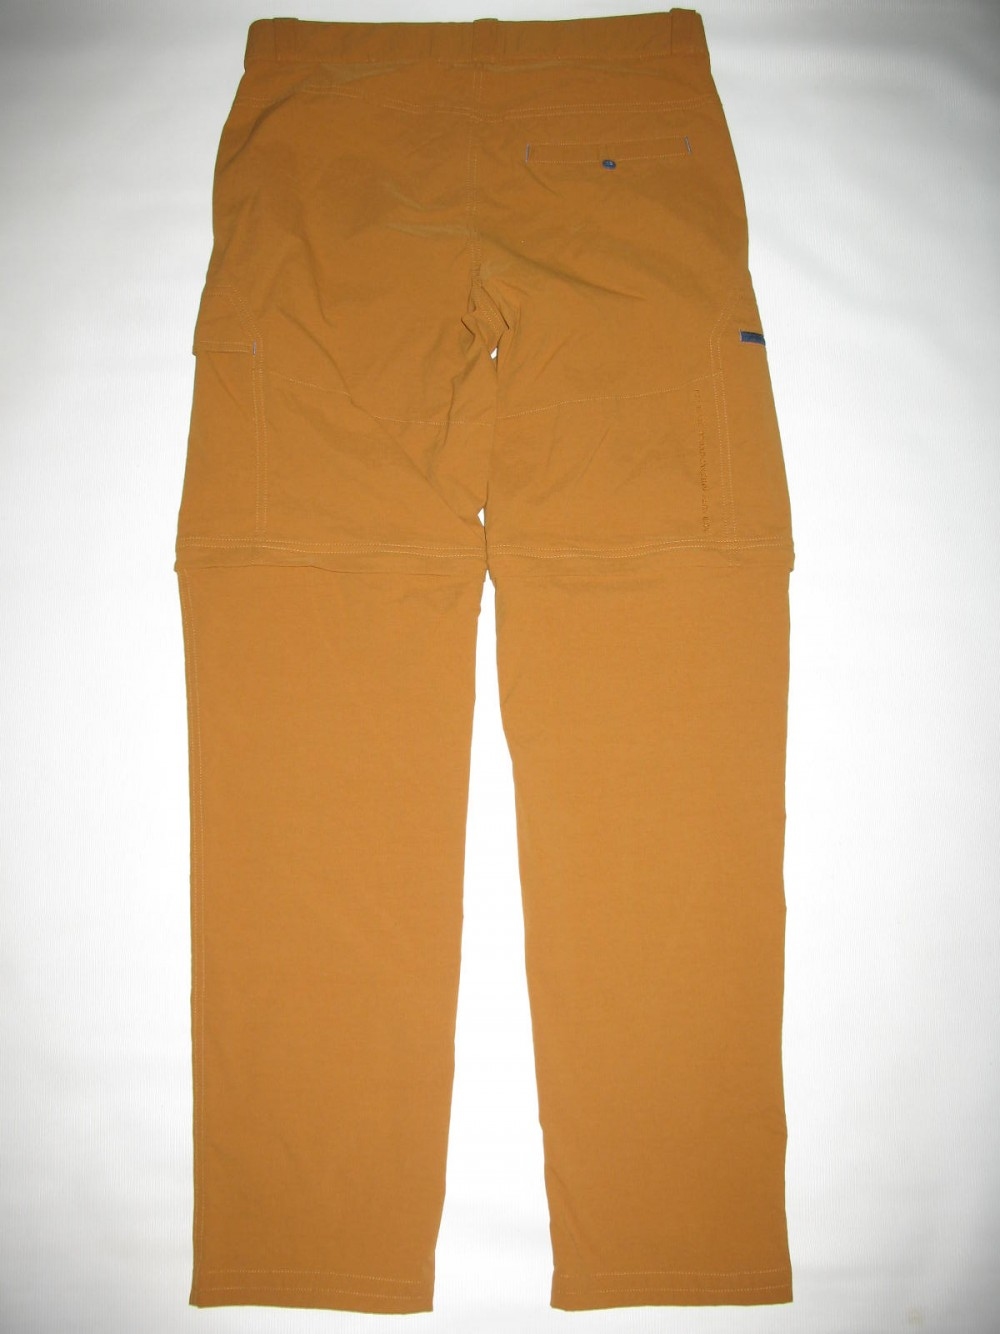 Штаны HELLY HANSEN obs olimpic 2in1 pants (размер M) - 2